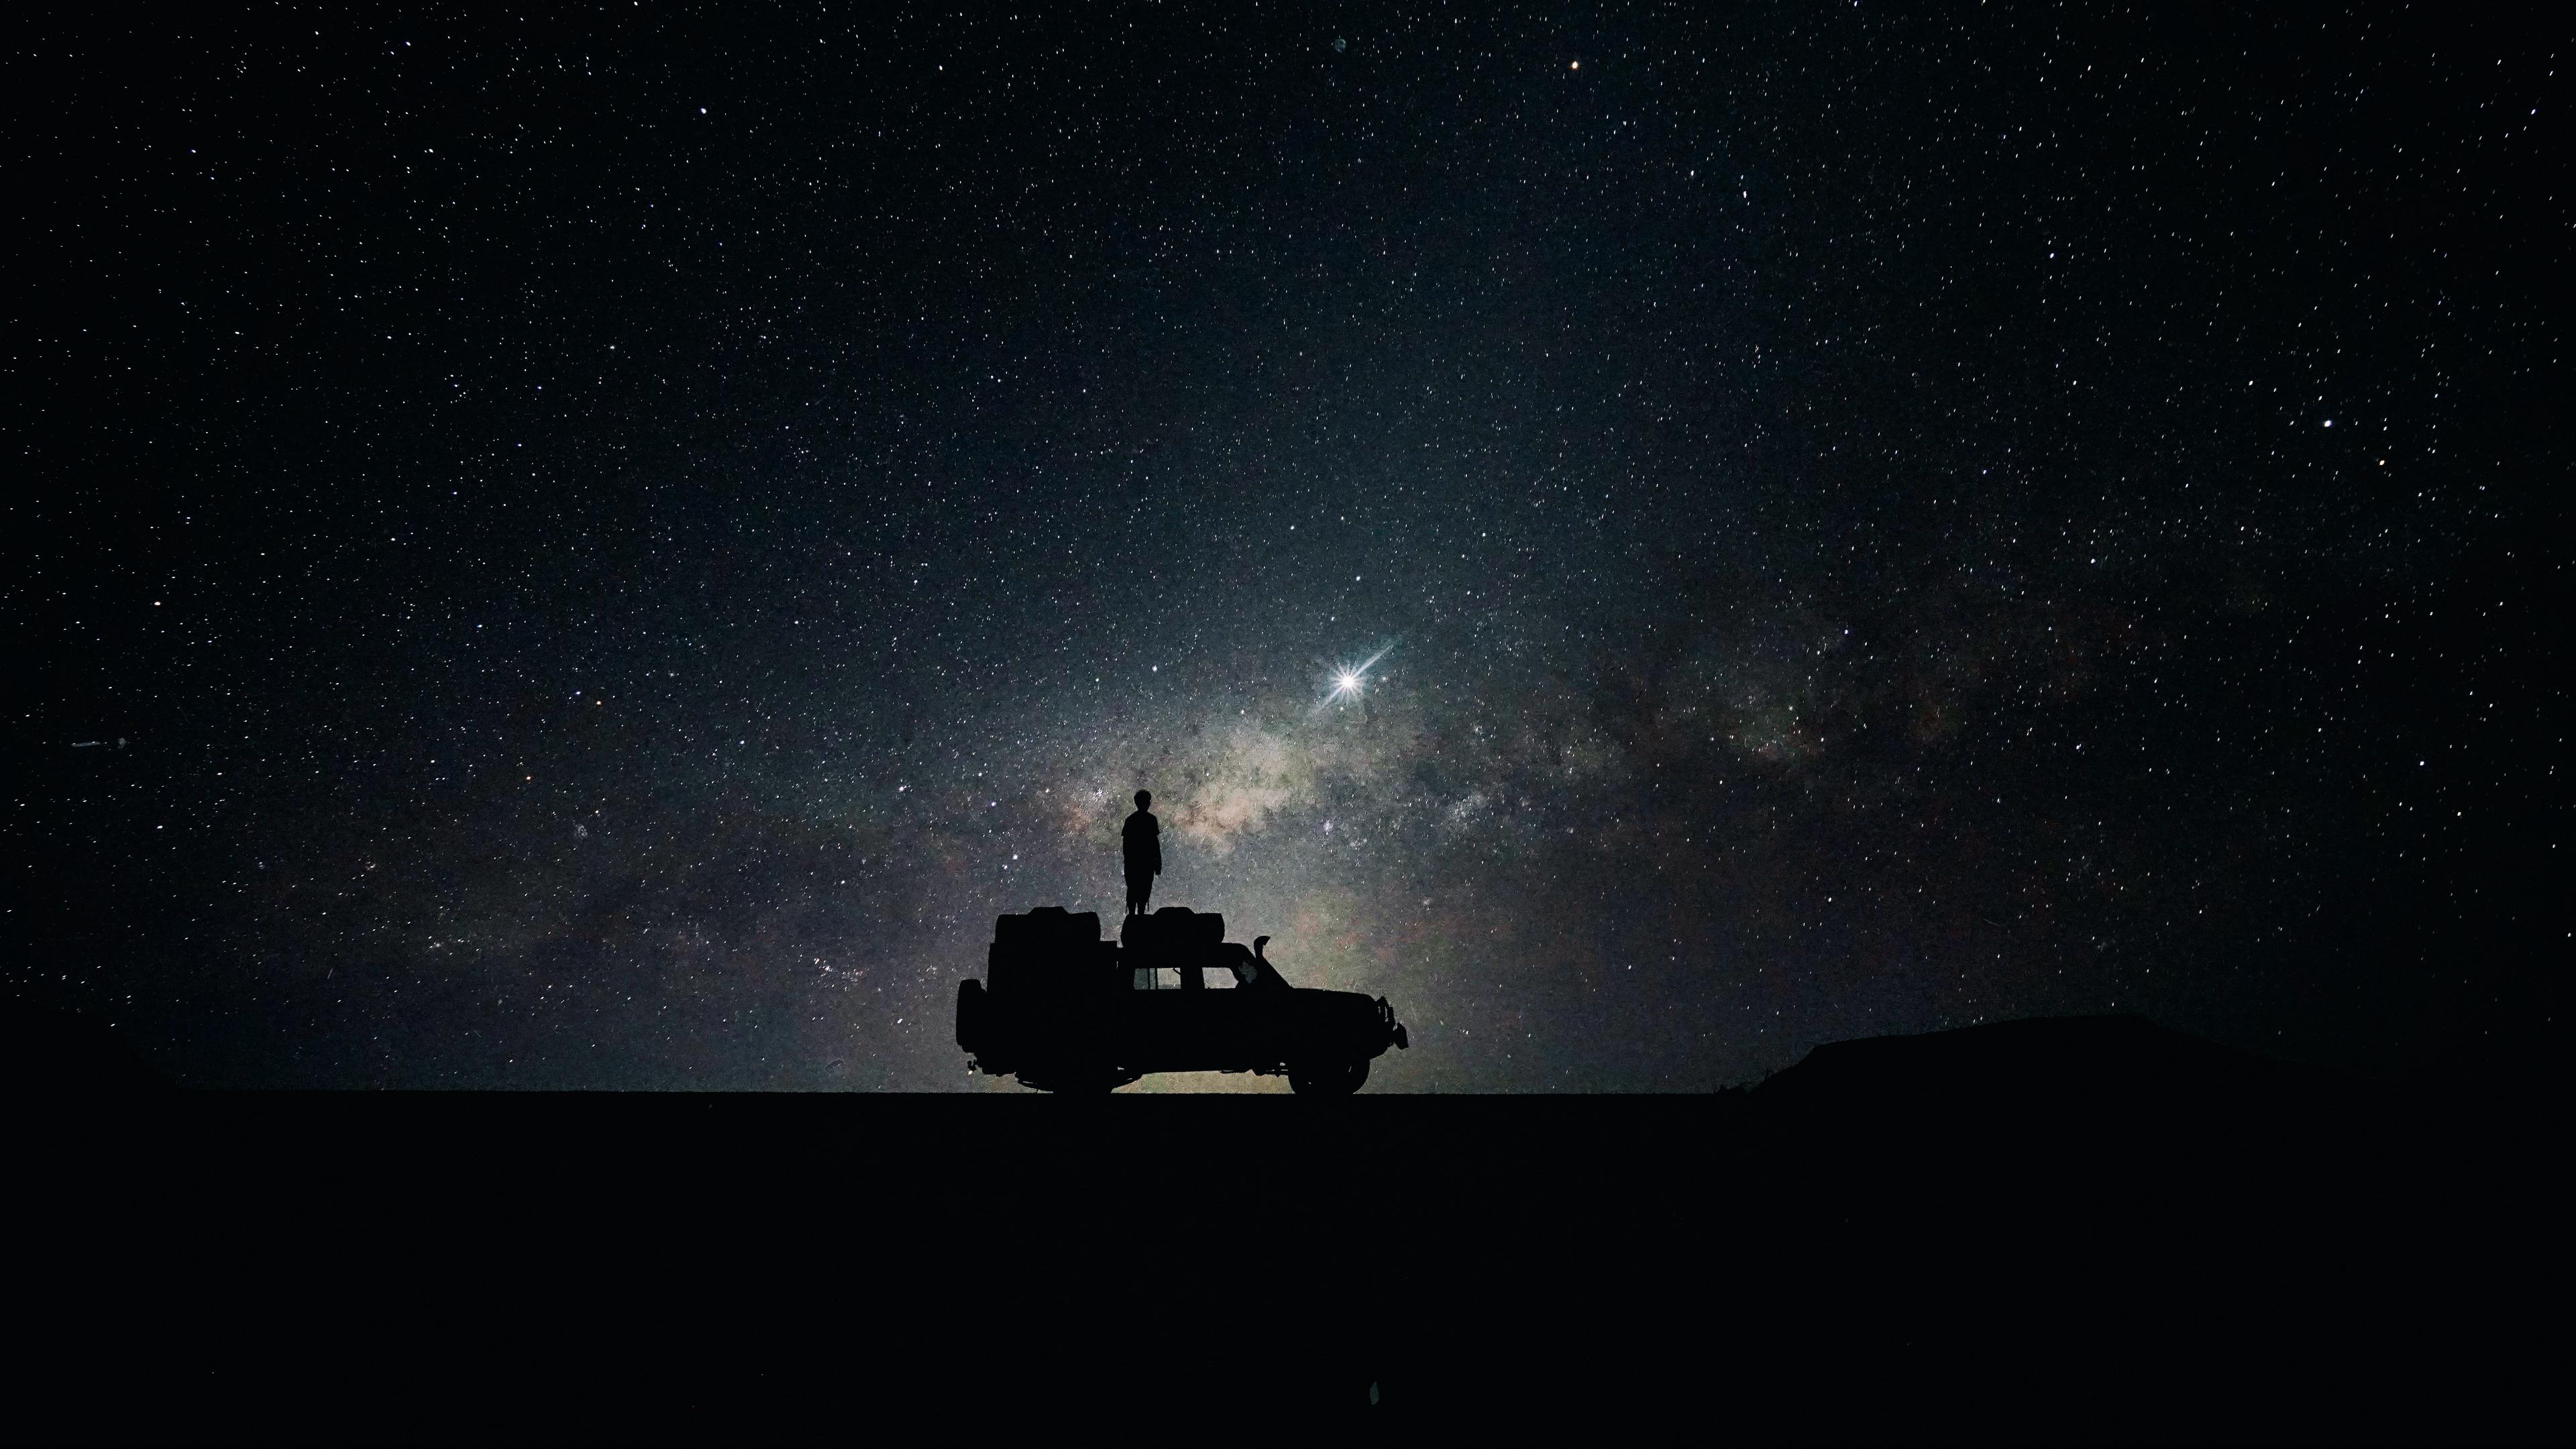 stars sky space car 4k 1536017156 - stars, sky, space, car 4k - Stars, Space, Sky